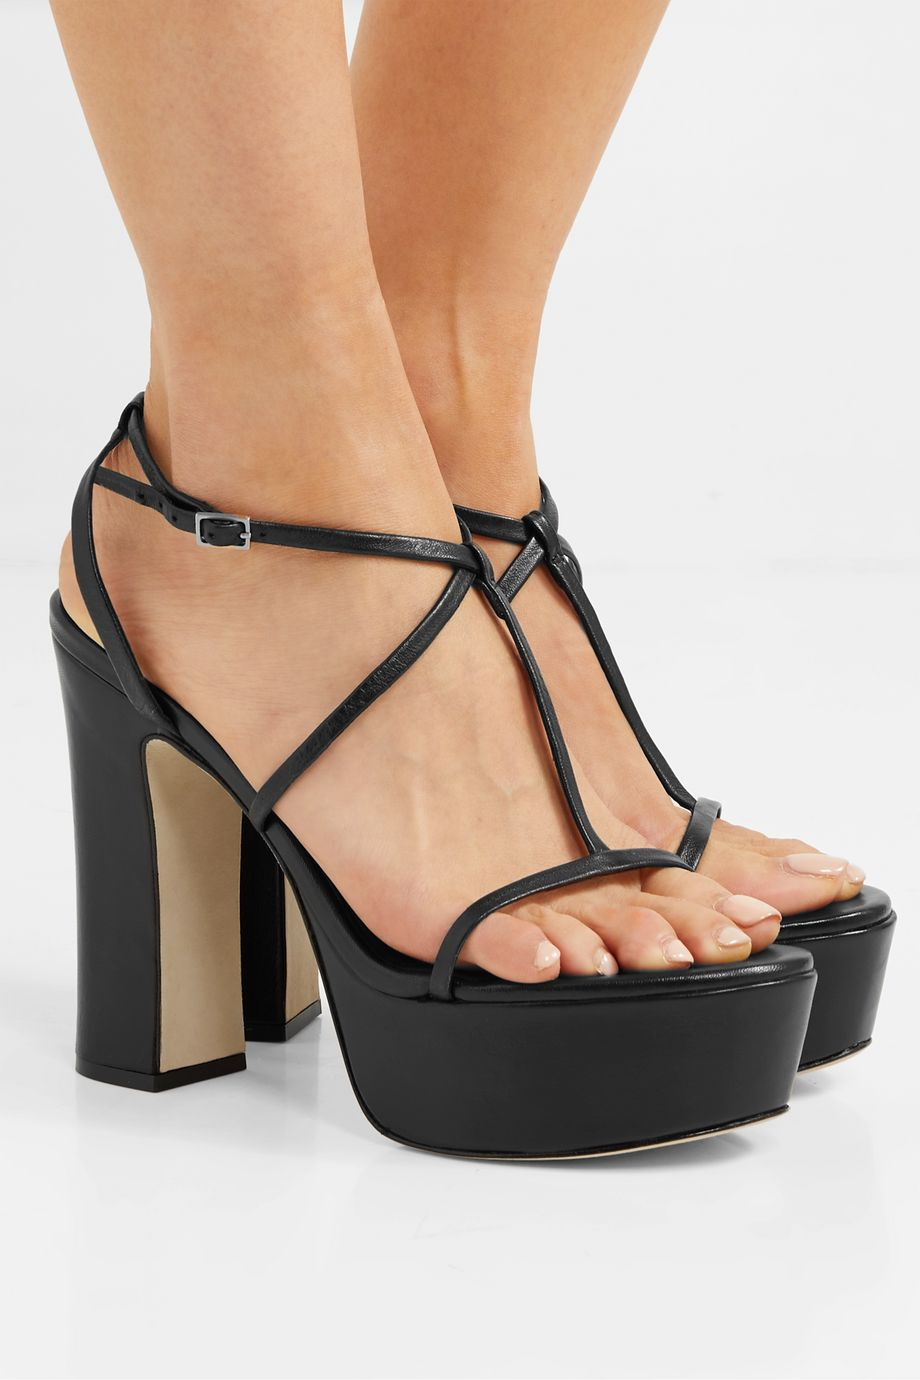 Cult Gaia Angela leather platform sandals